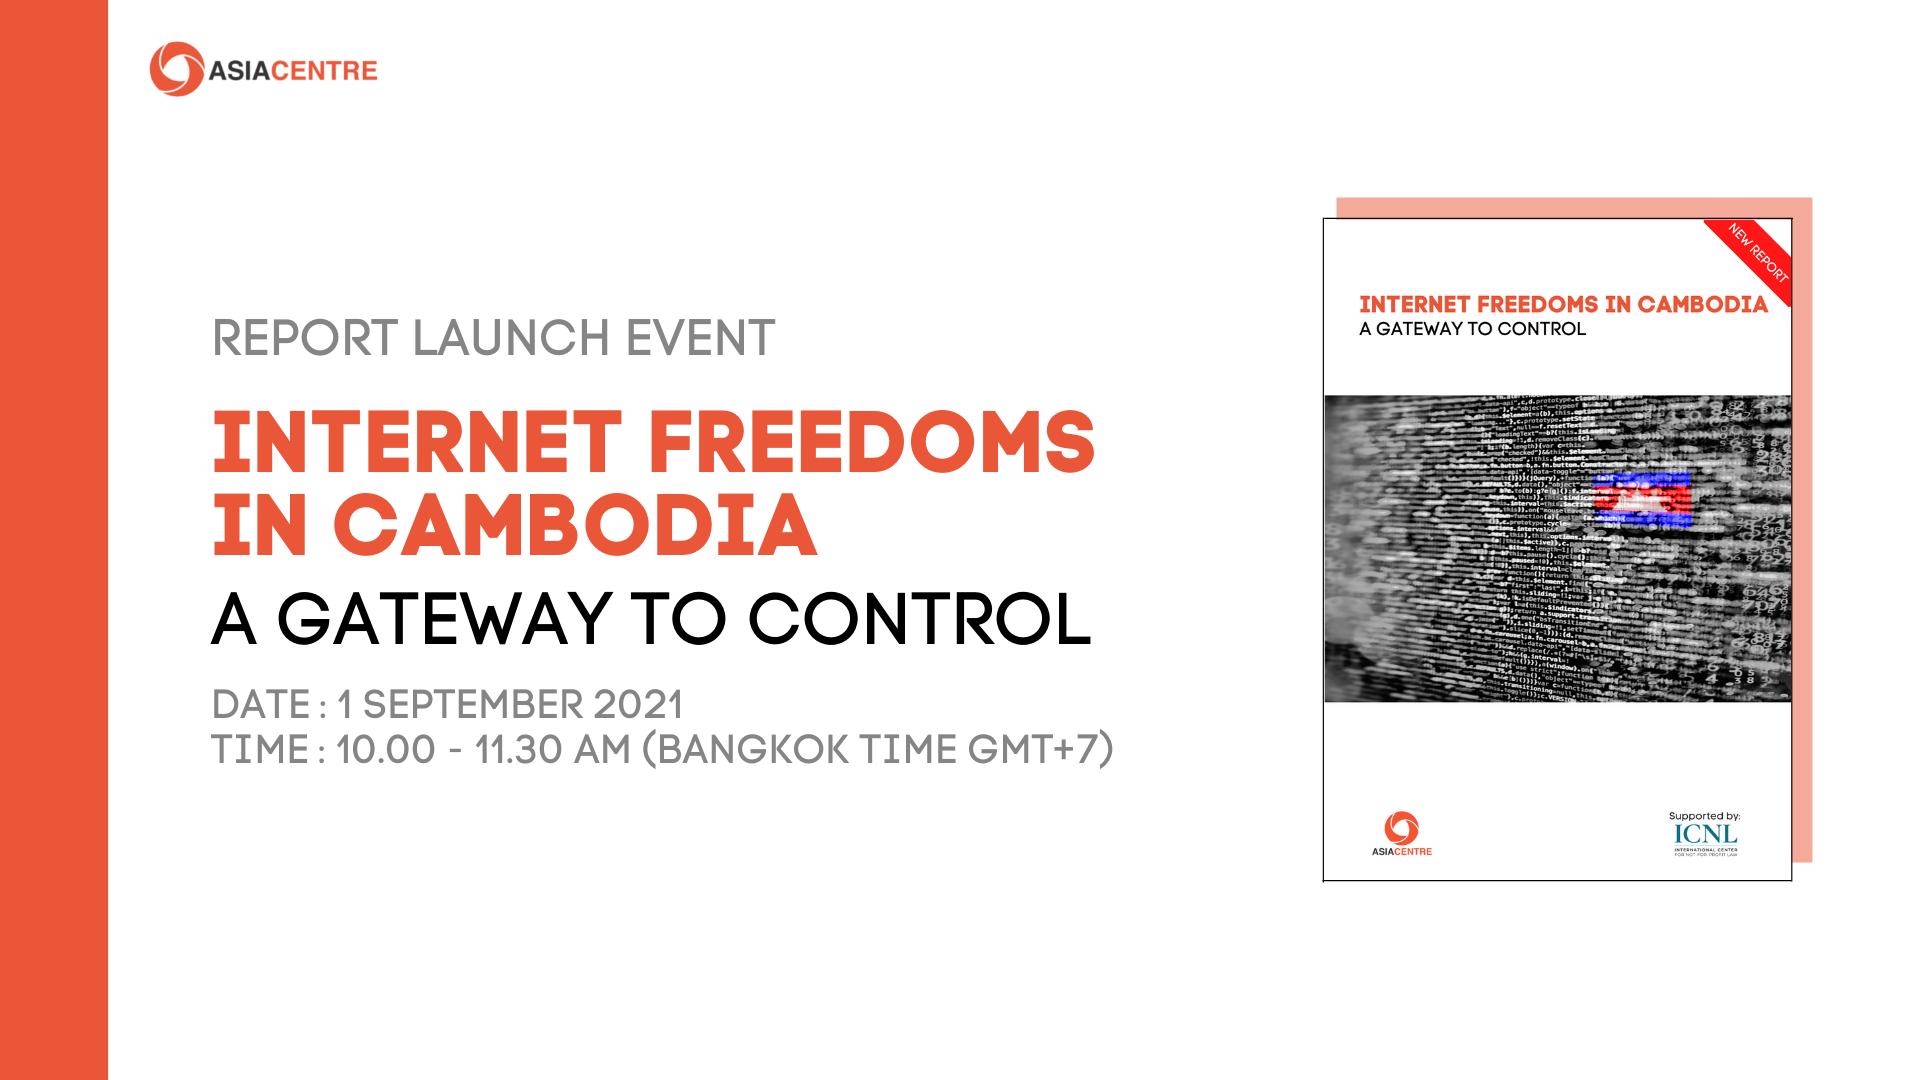 Internet Freedom in Cambodia A Gateway to Control